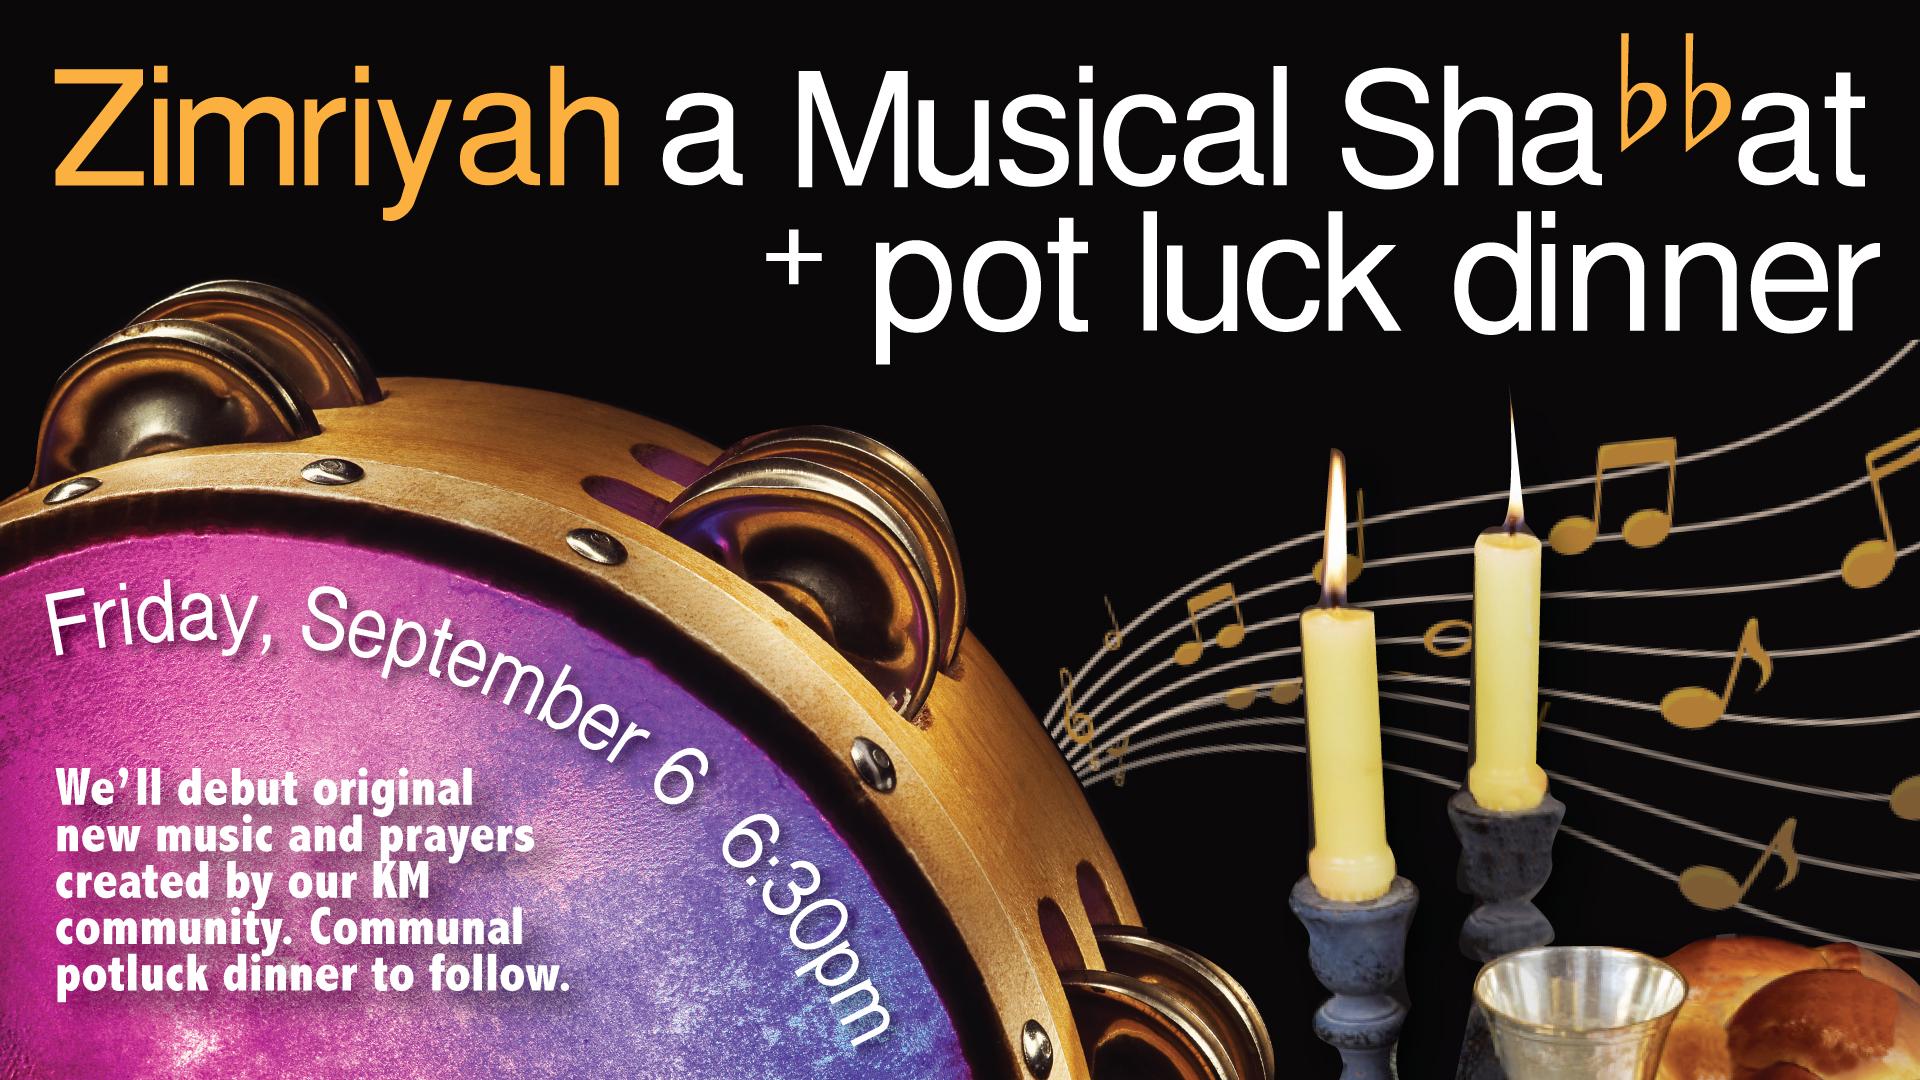 Musical Shabbat and Potluck